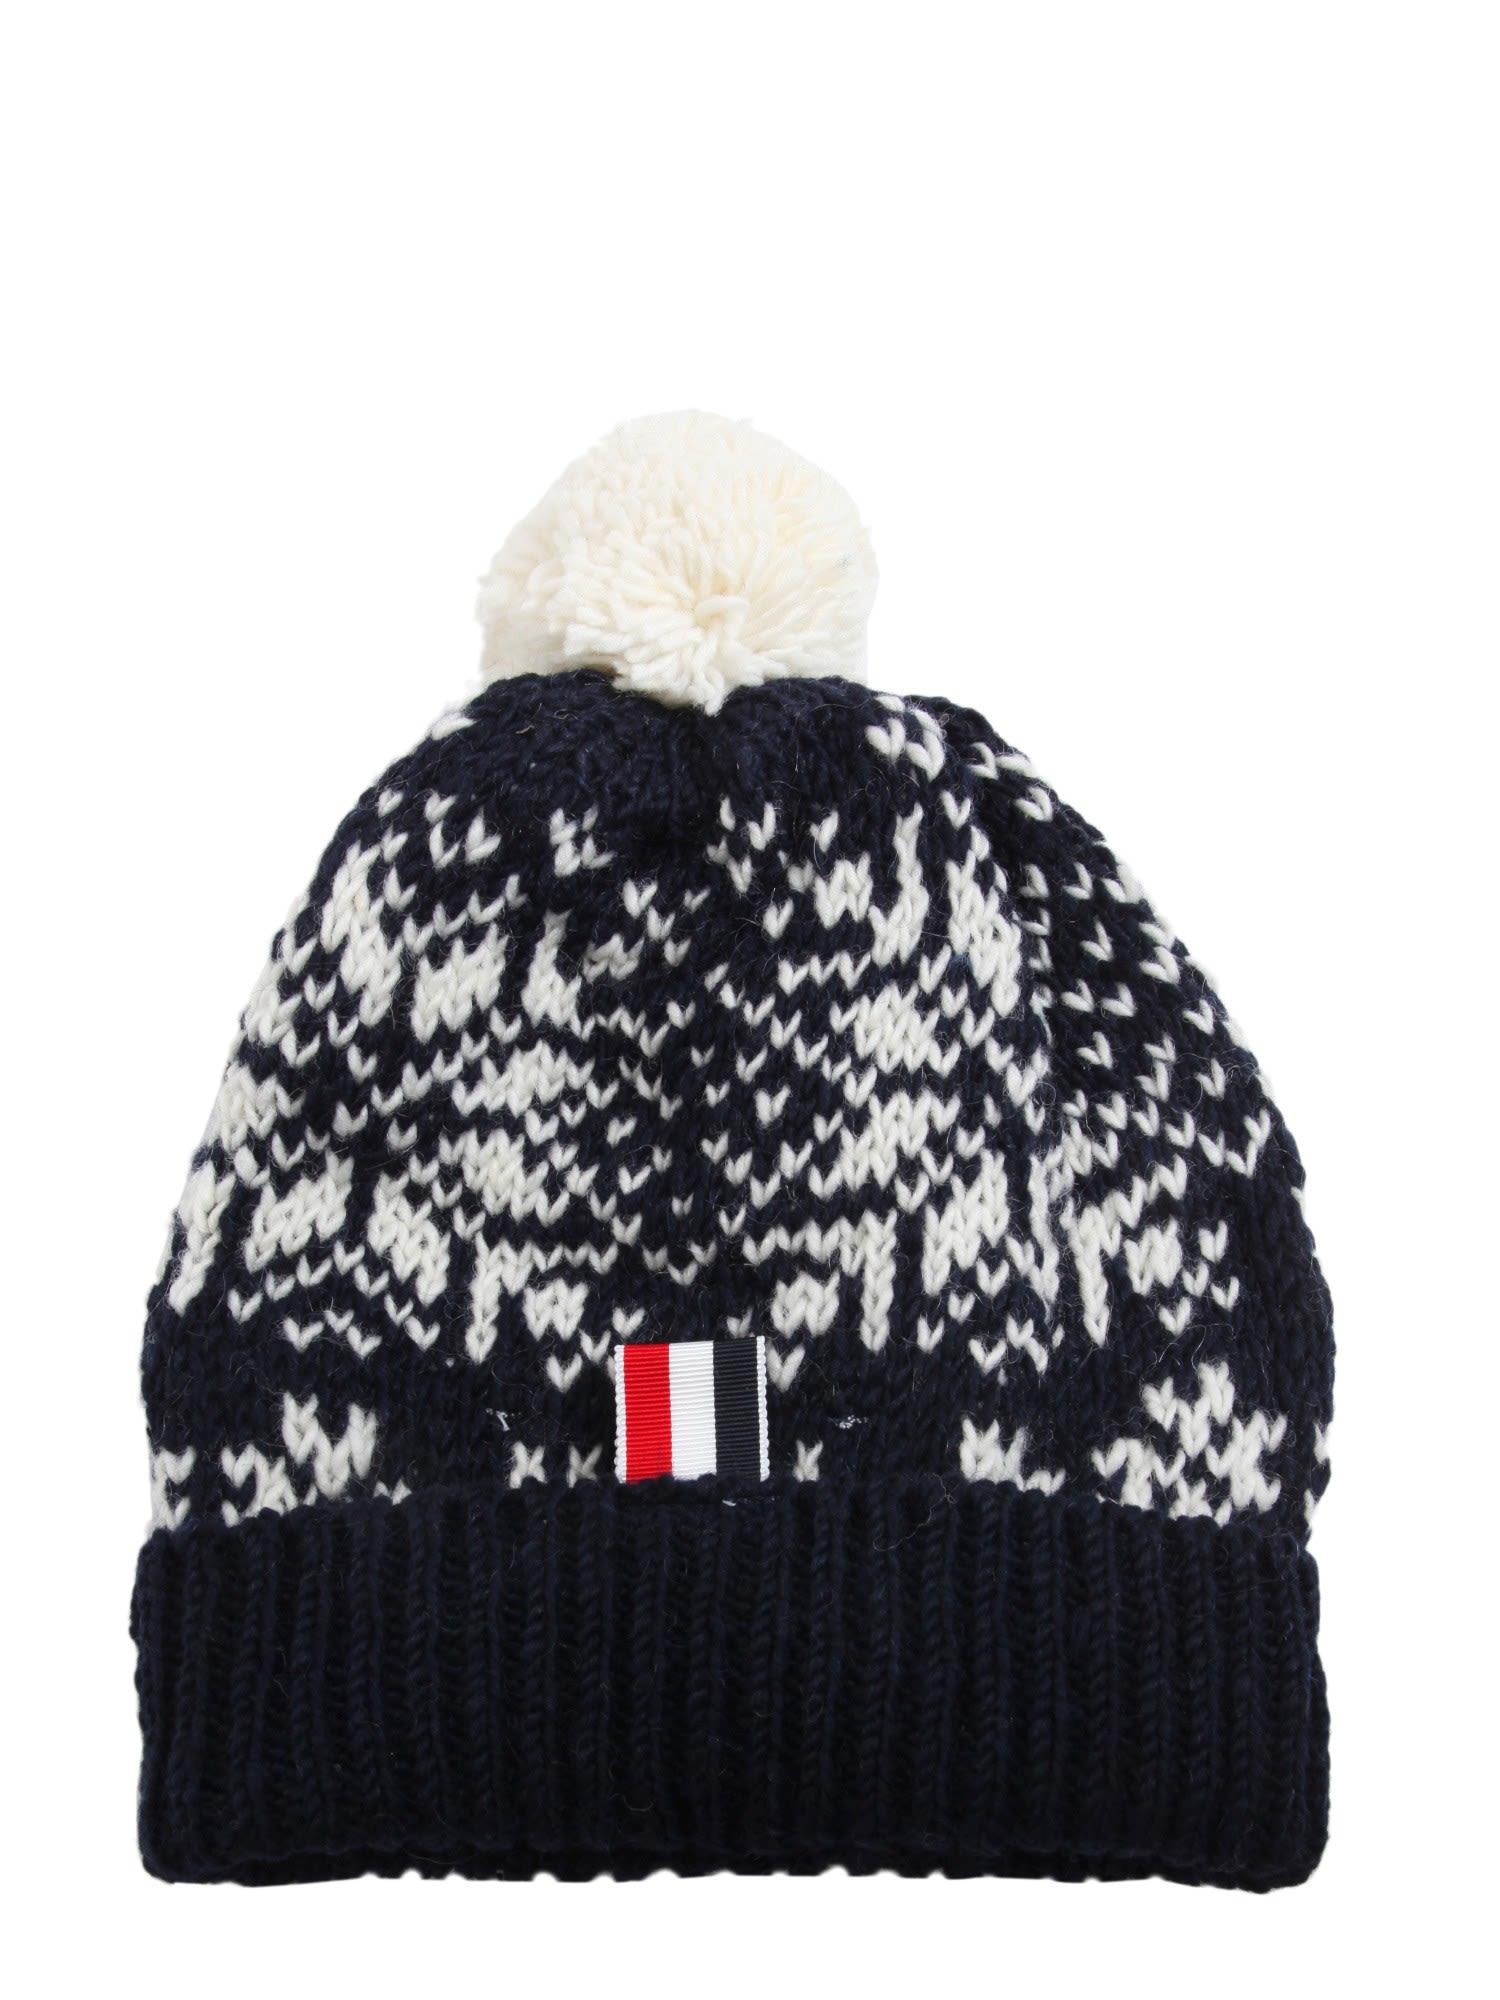 Thom Browne Fair Isle Snowflake-Pattern Wool-Mohair Beanie In Navy ... 91b495c08cb8